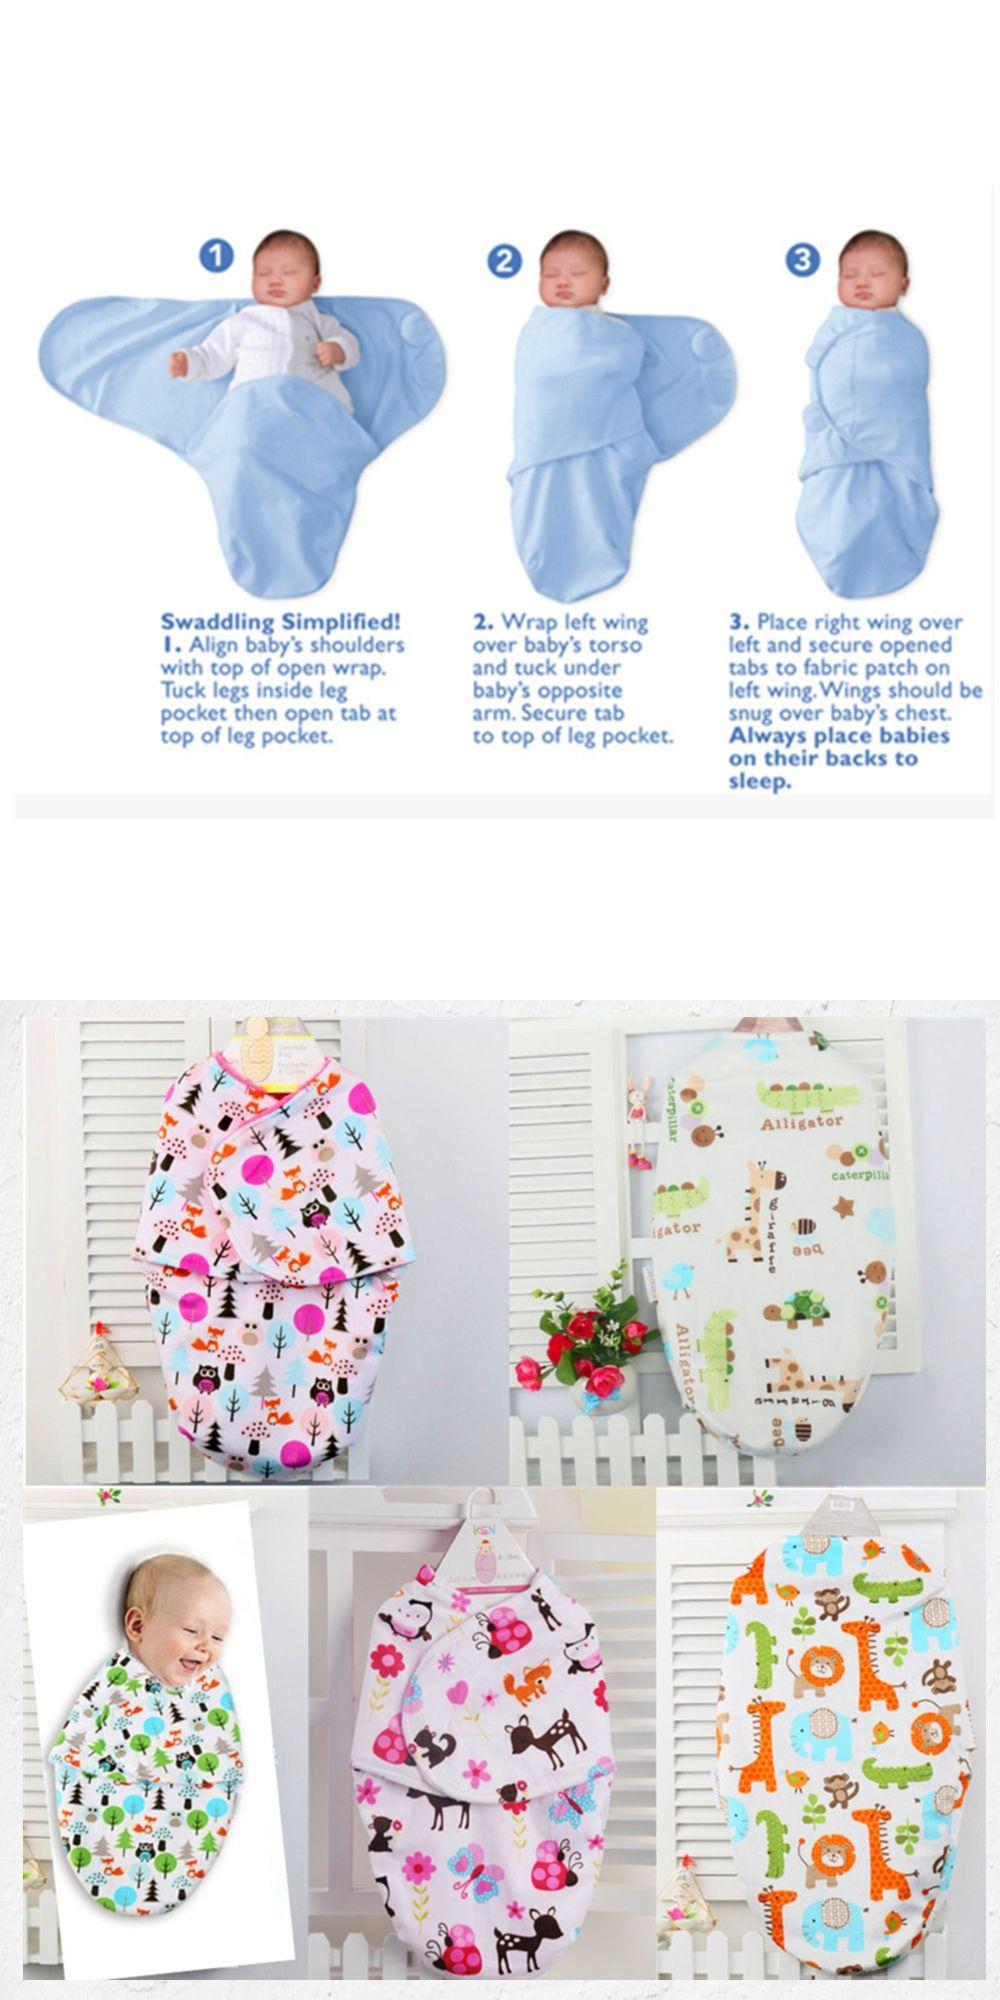 e940ff9f76093 Baby Swaddling Blankets Newborn Infant 100% Towel Wrap Soft Flannel  Parisarc Envelope Double Layer Cotton